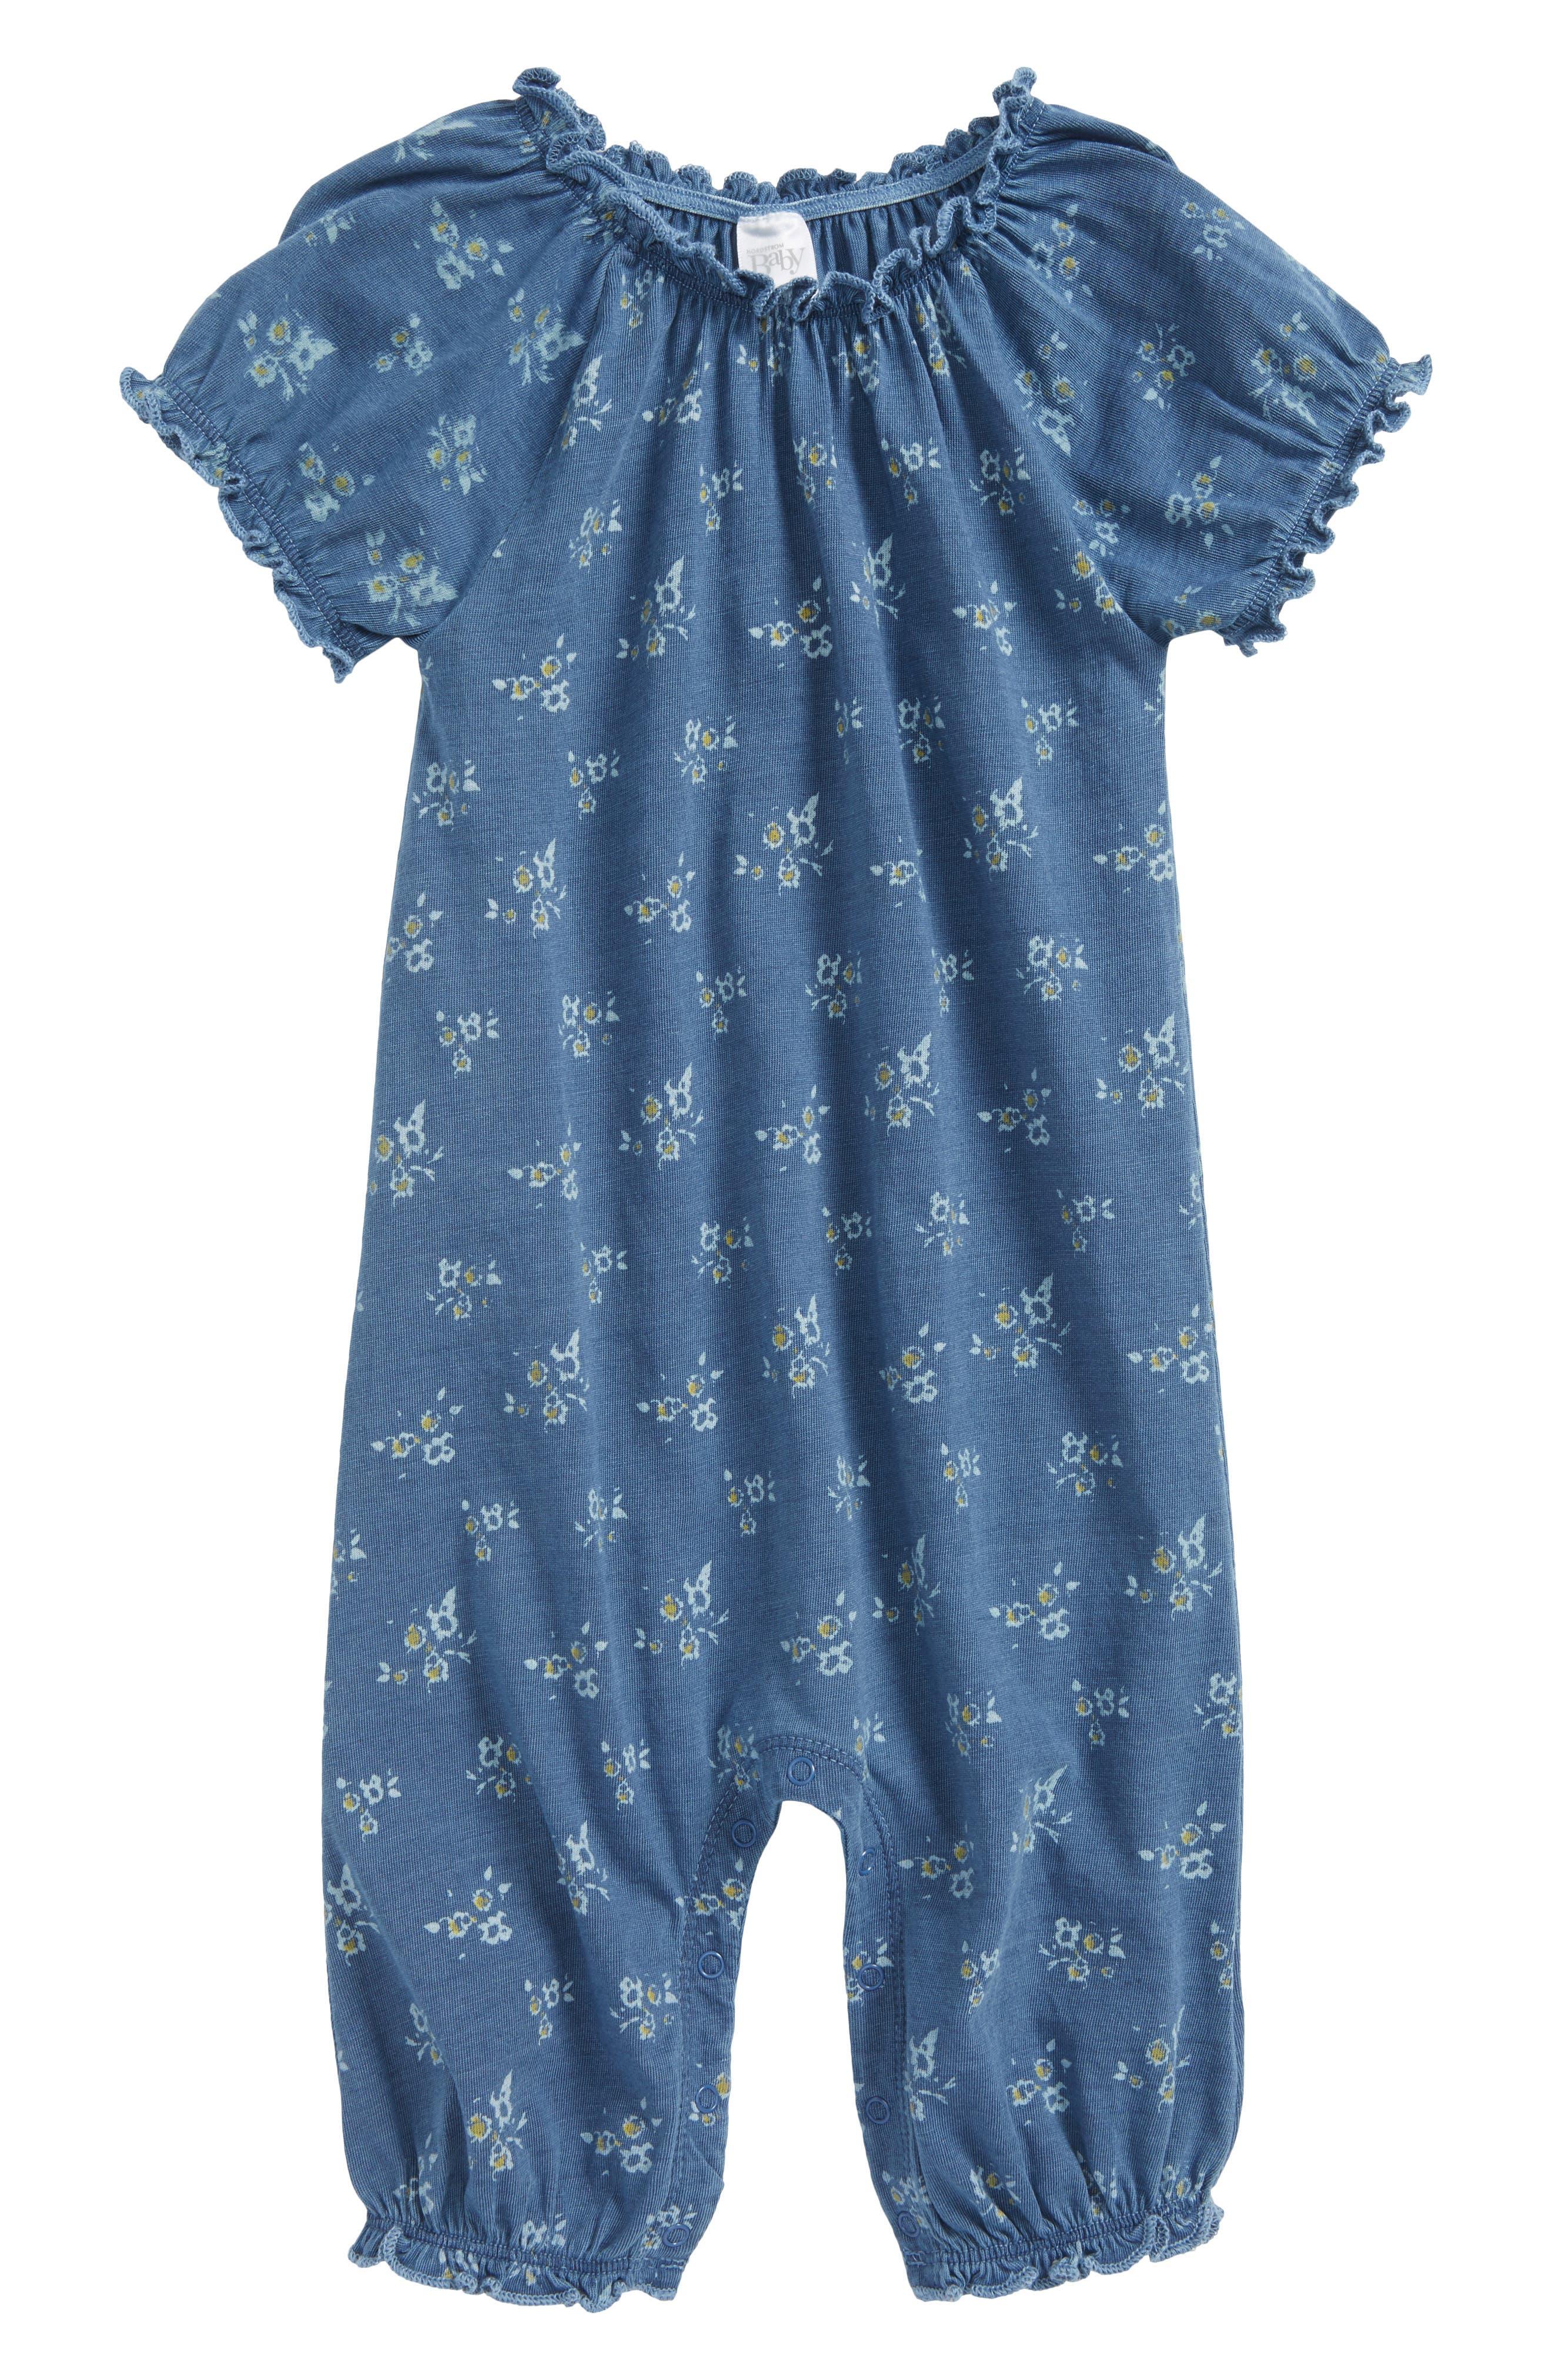 Ruffle Romper,                         Main,                         color, Blue Indigo Floral